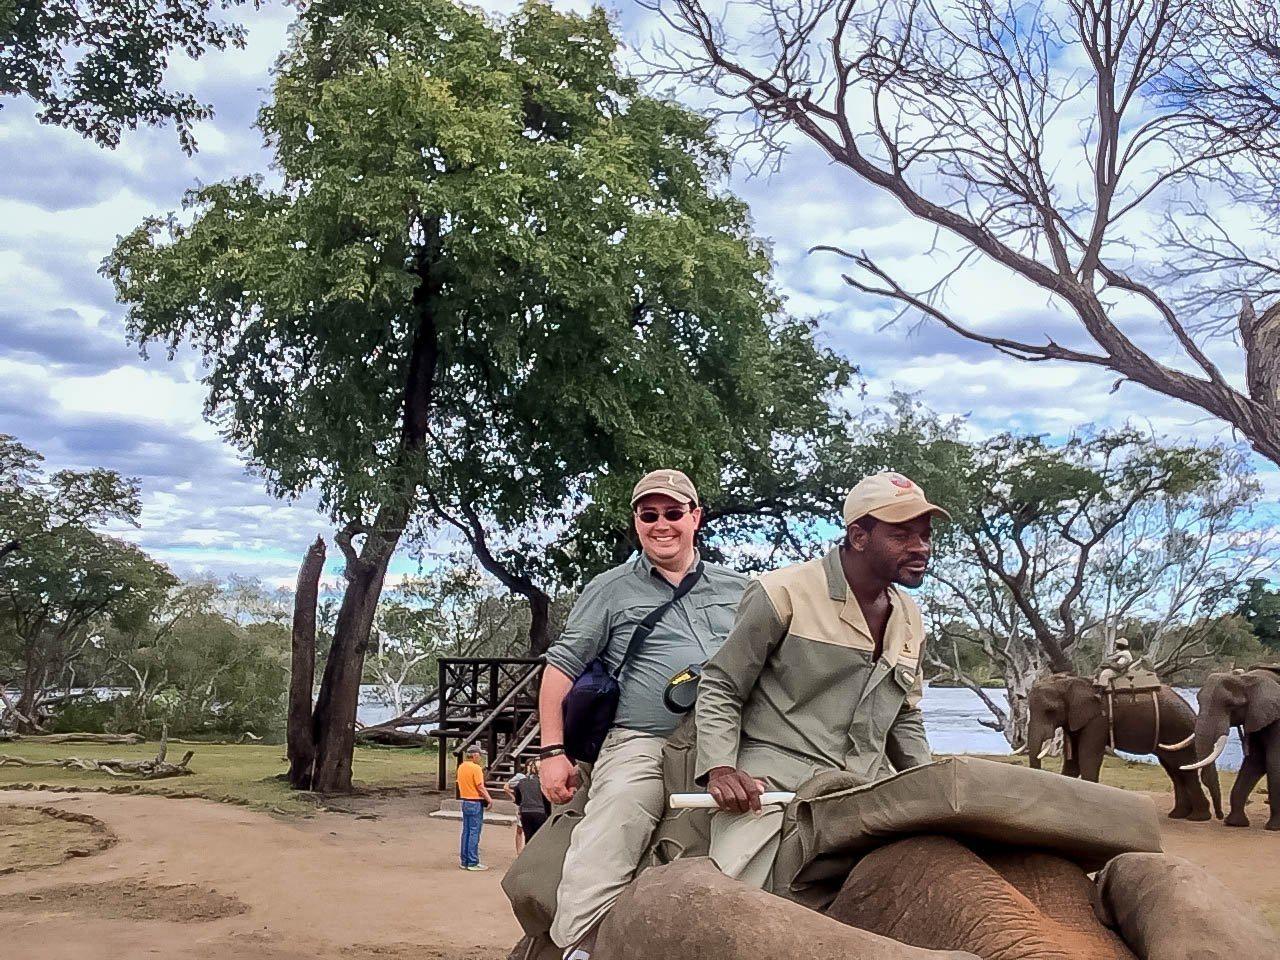 People on elephant back